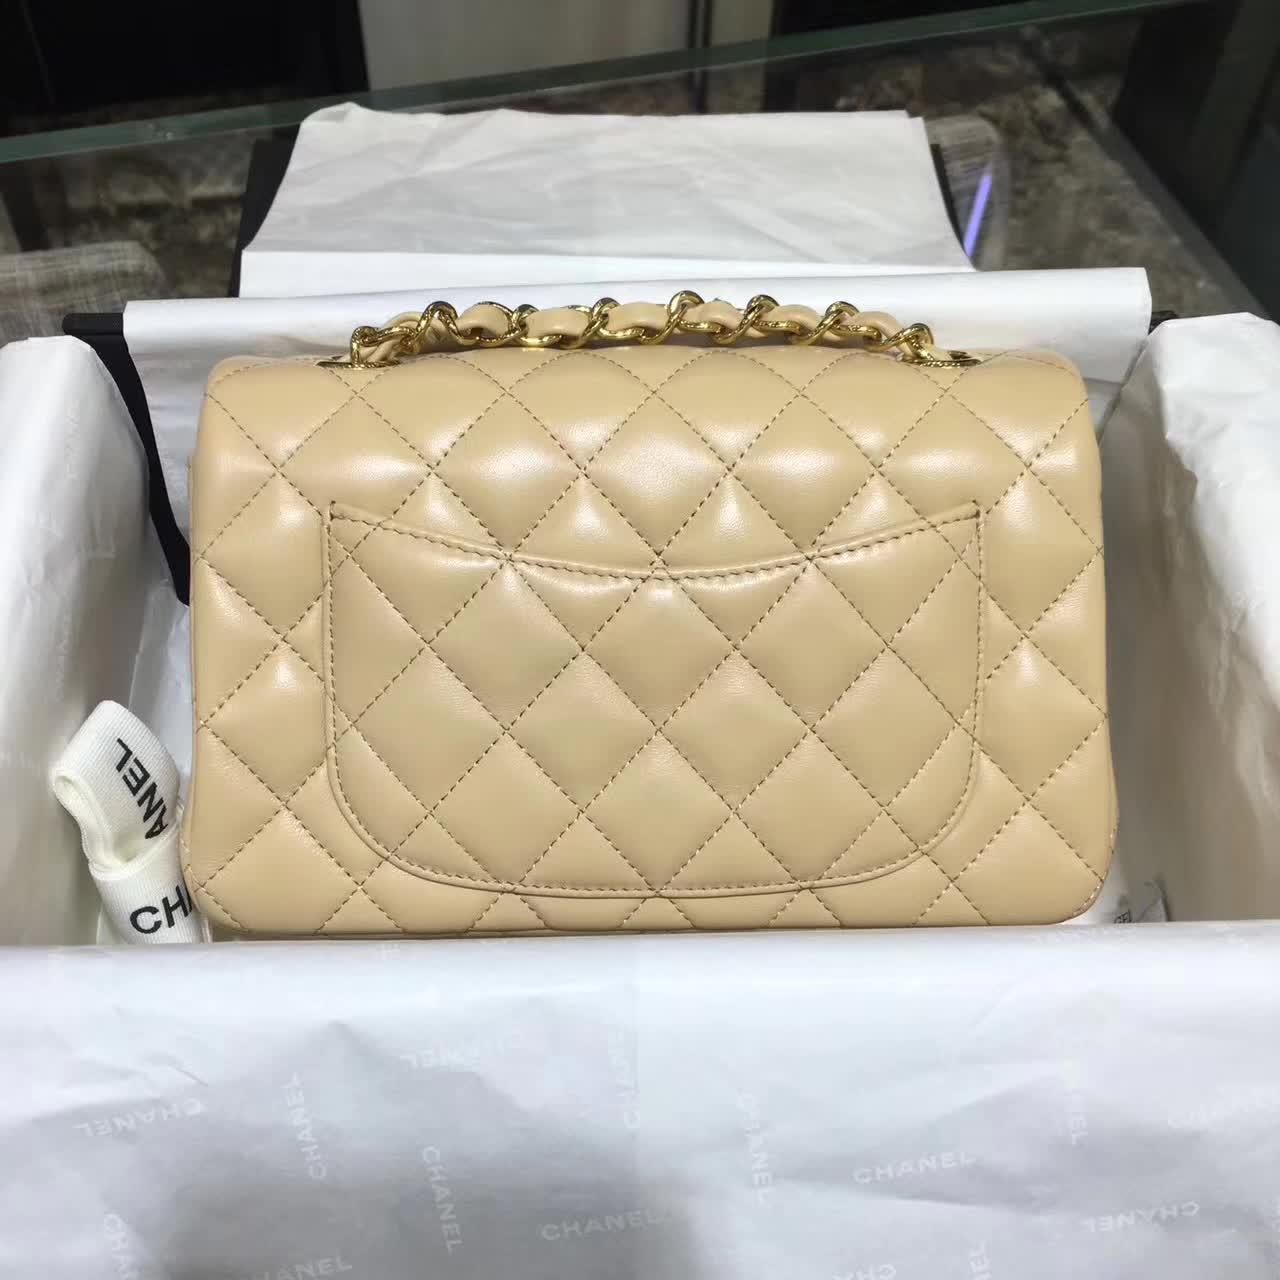 Chanel 香奈儿 Classic Flap 小羊皮 杏色 20cm  五金:金色